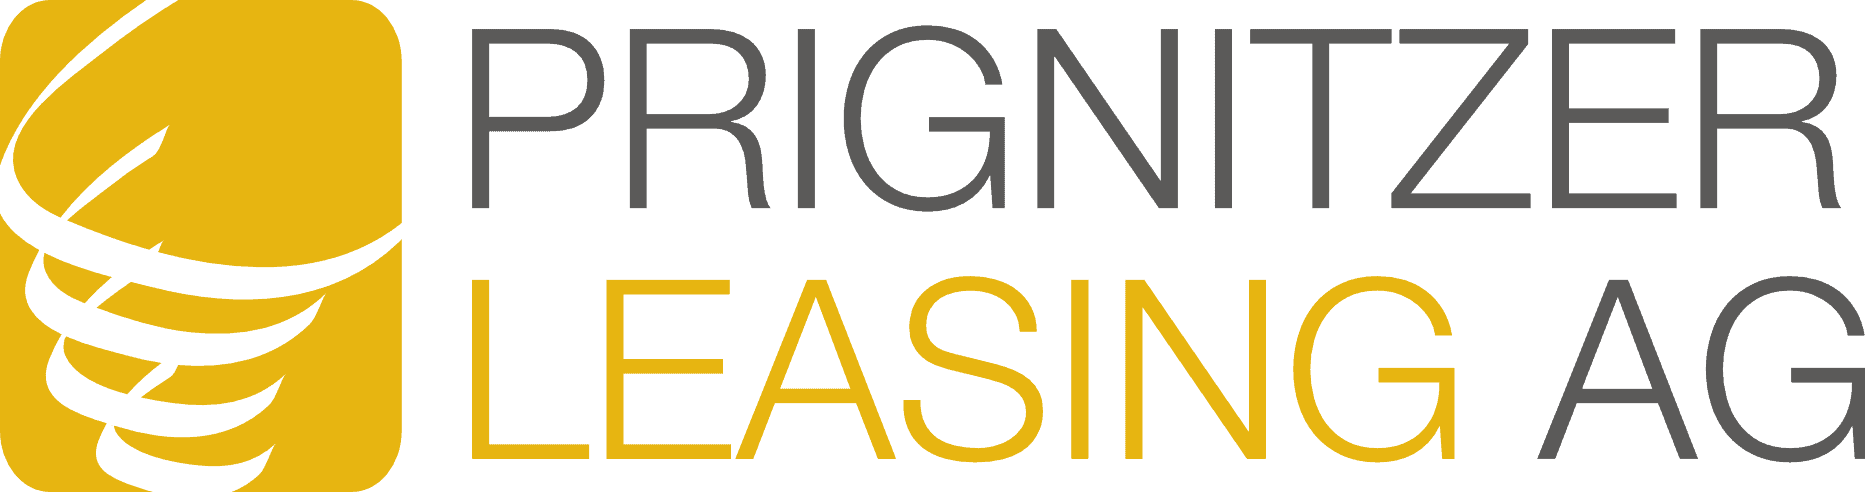 Prignitzer Leasing AG